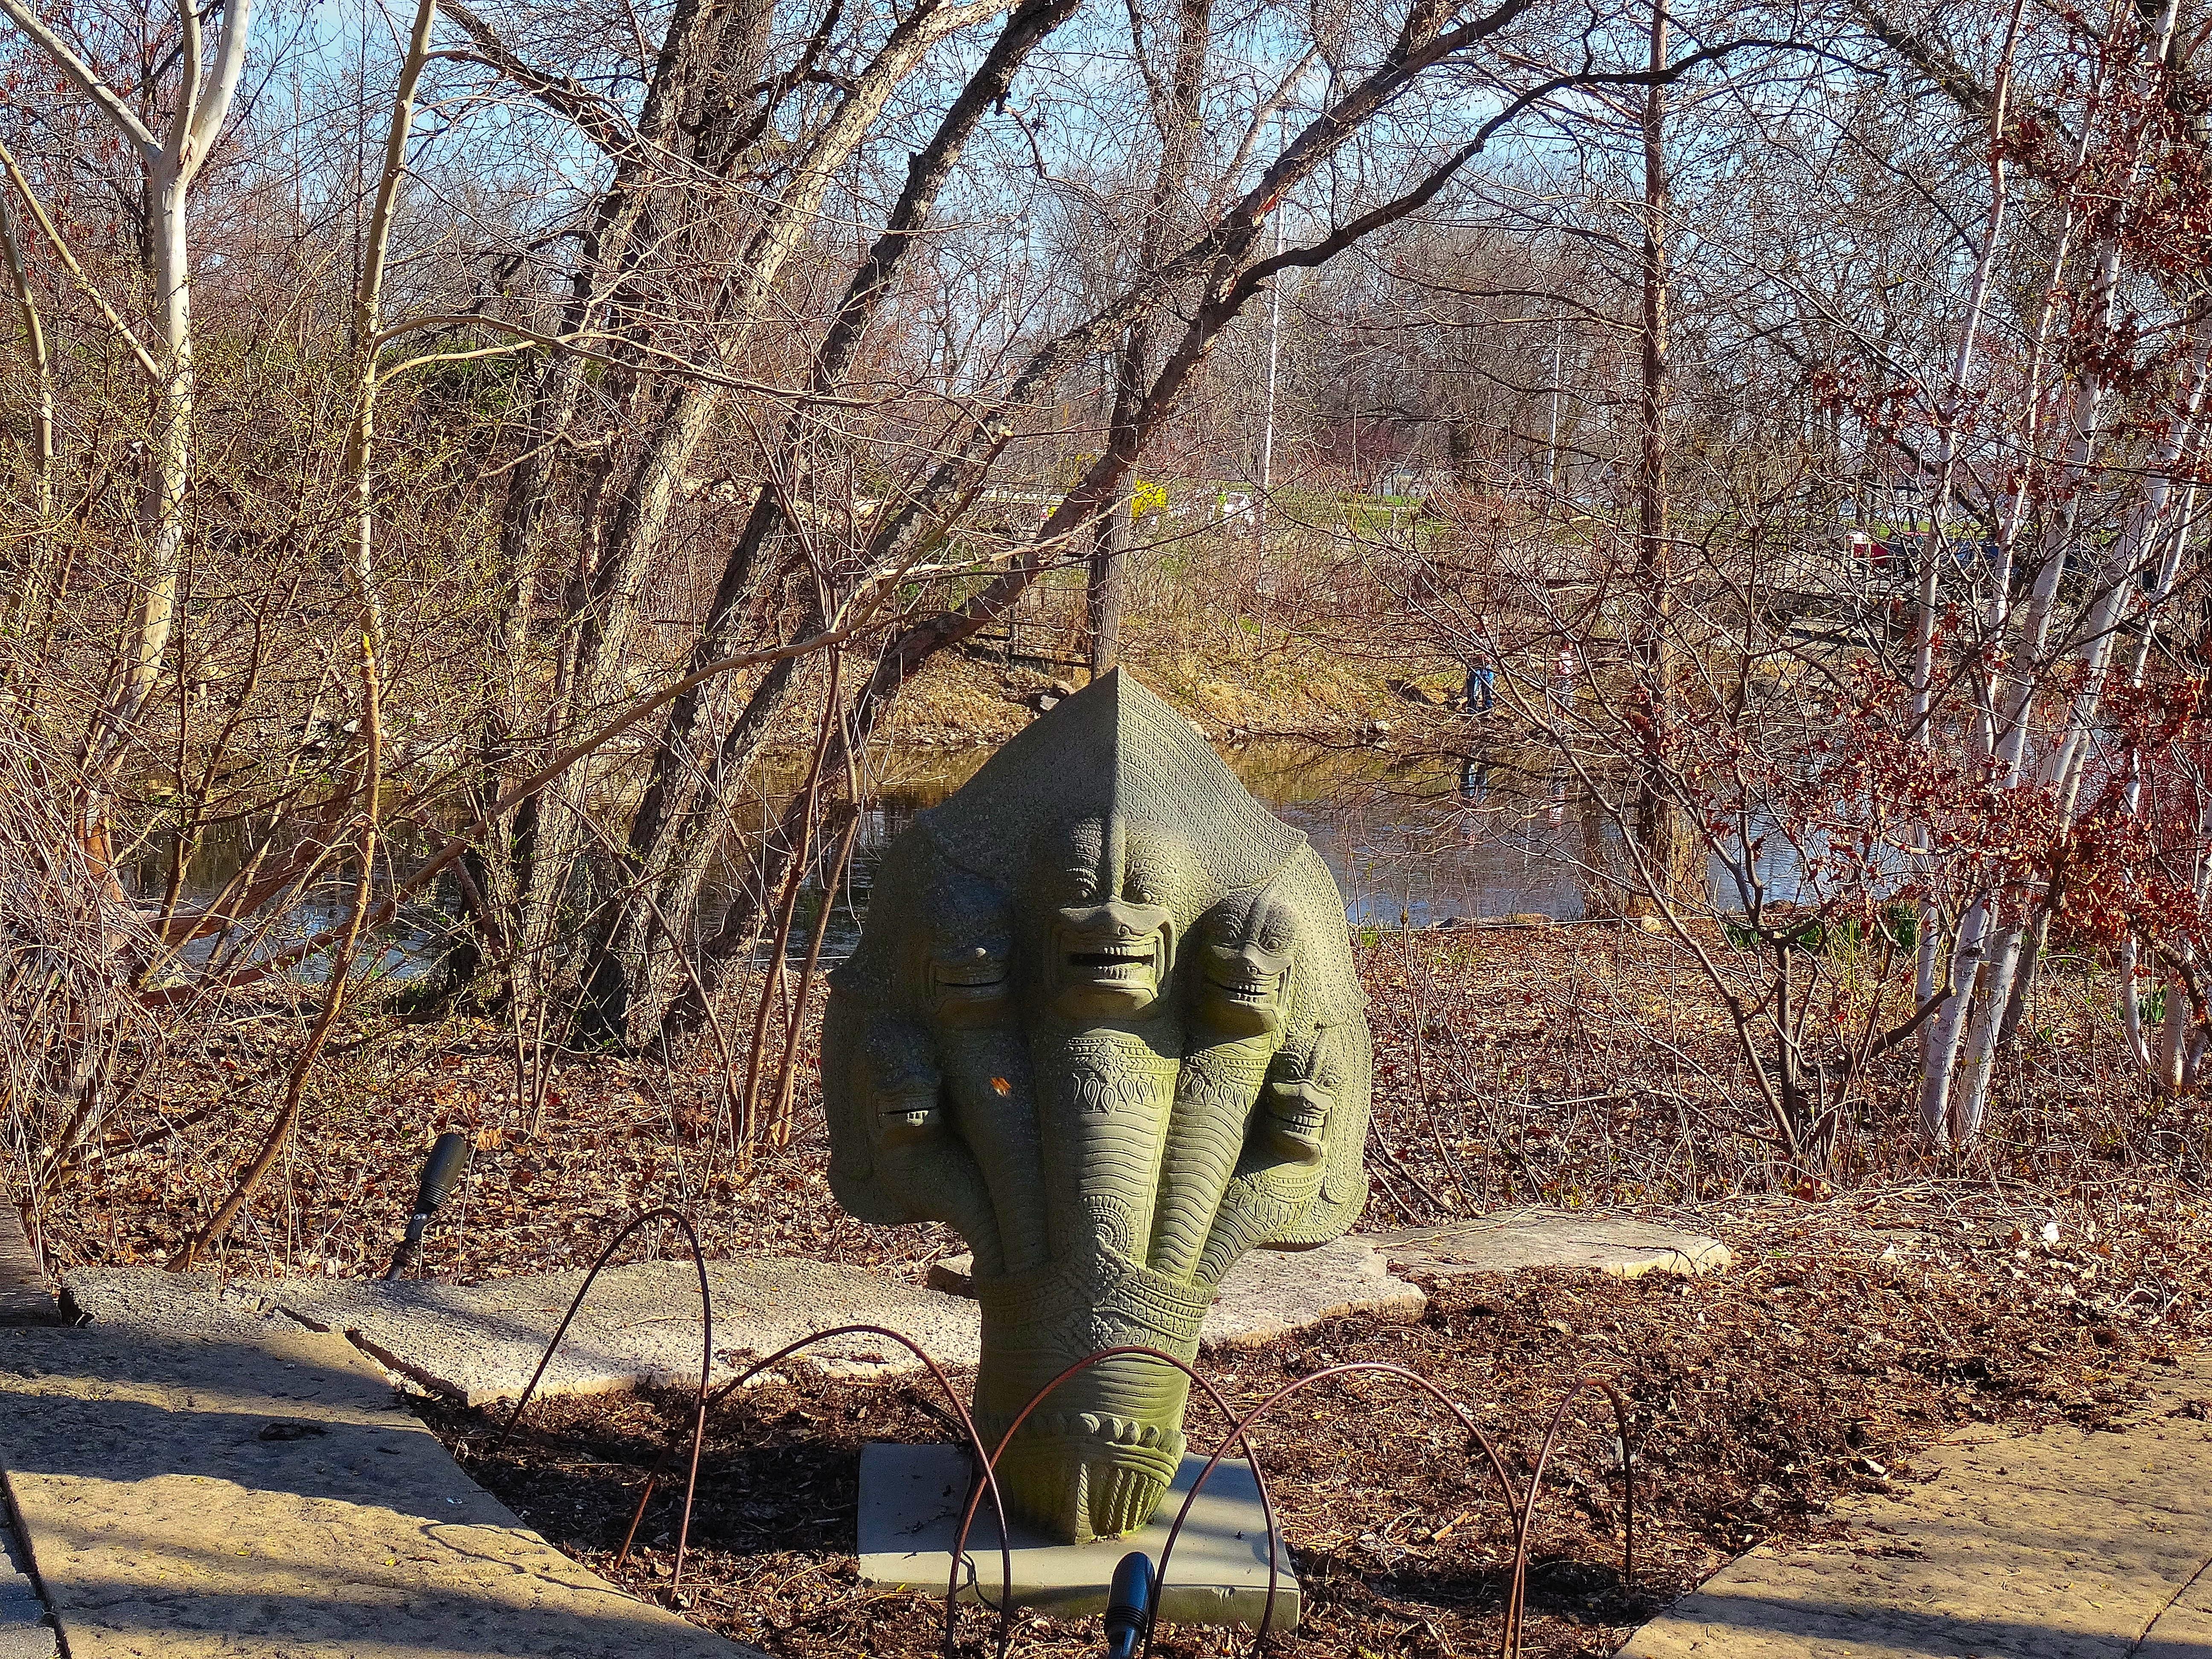 File:Olbrich Botanical Gardens- Stone Tablets - panoramio.jpg ...